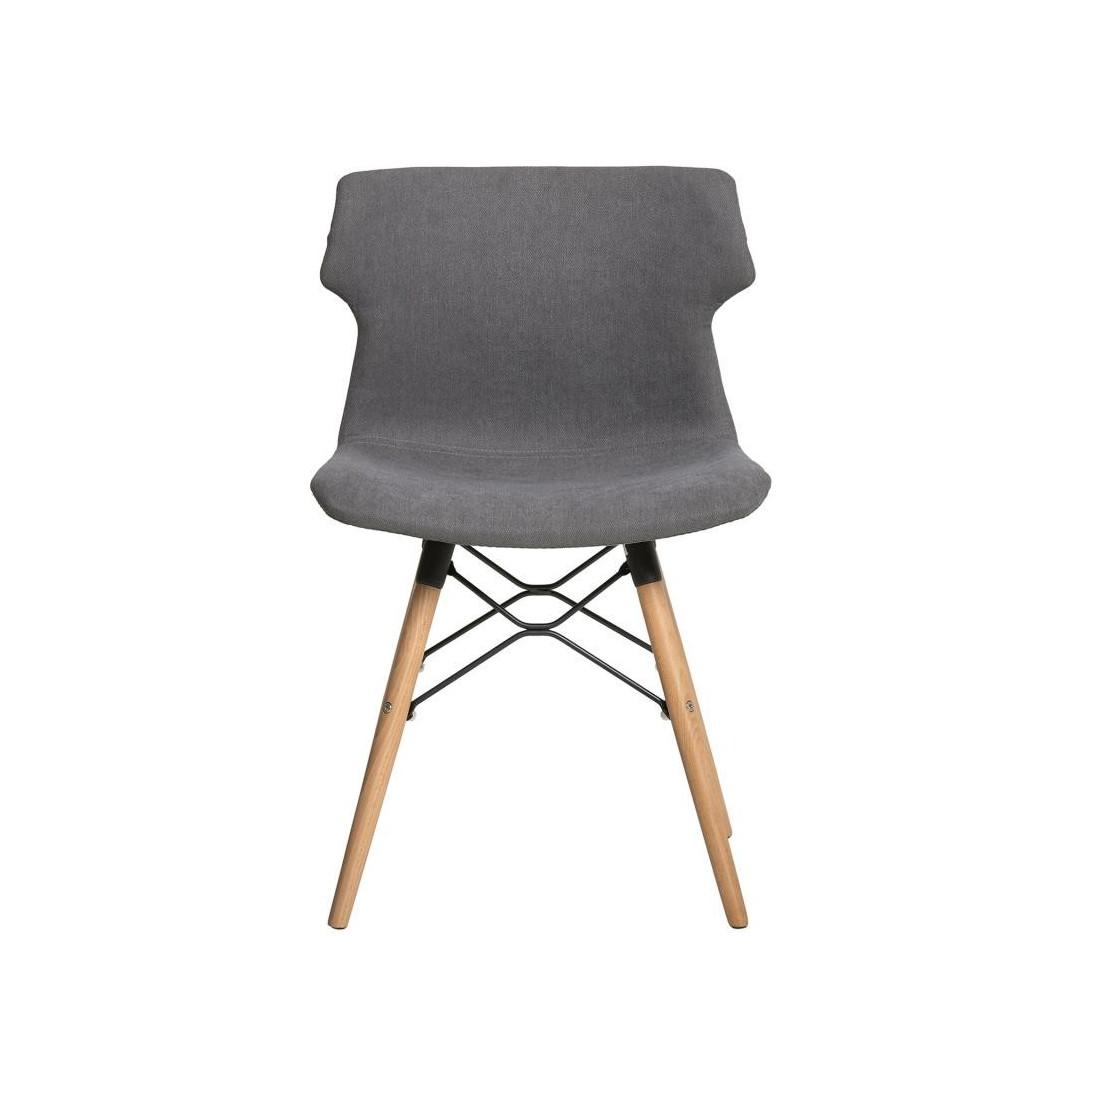 chaise tissu gris anthracite amazing chaise lf lot de fauteuils kenna tissu gris fonc with. Black Bedroom Furniture Sets. Home Design Ideas